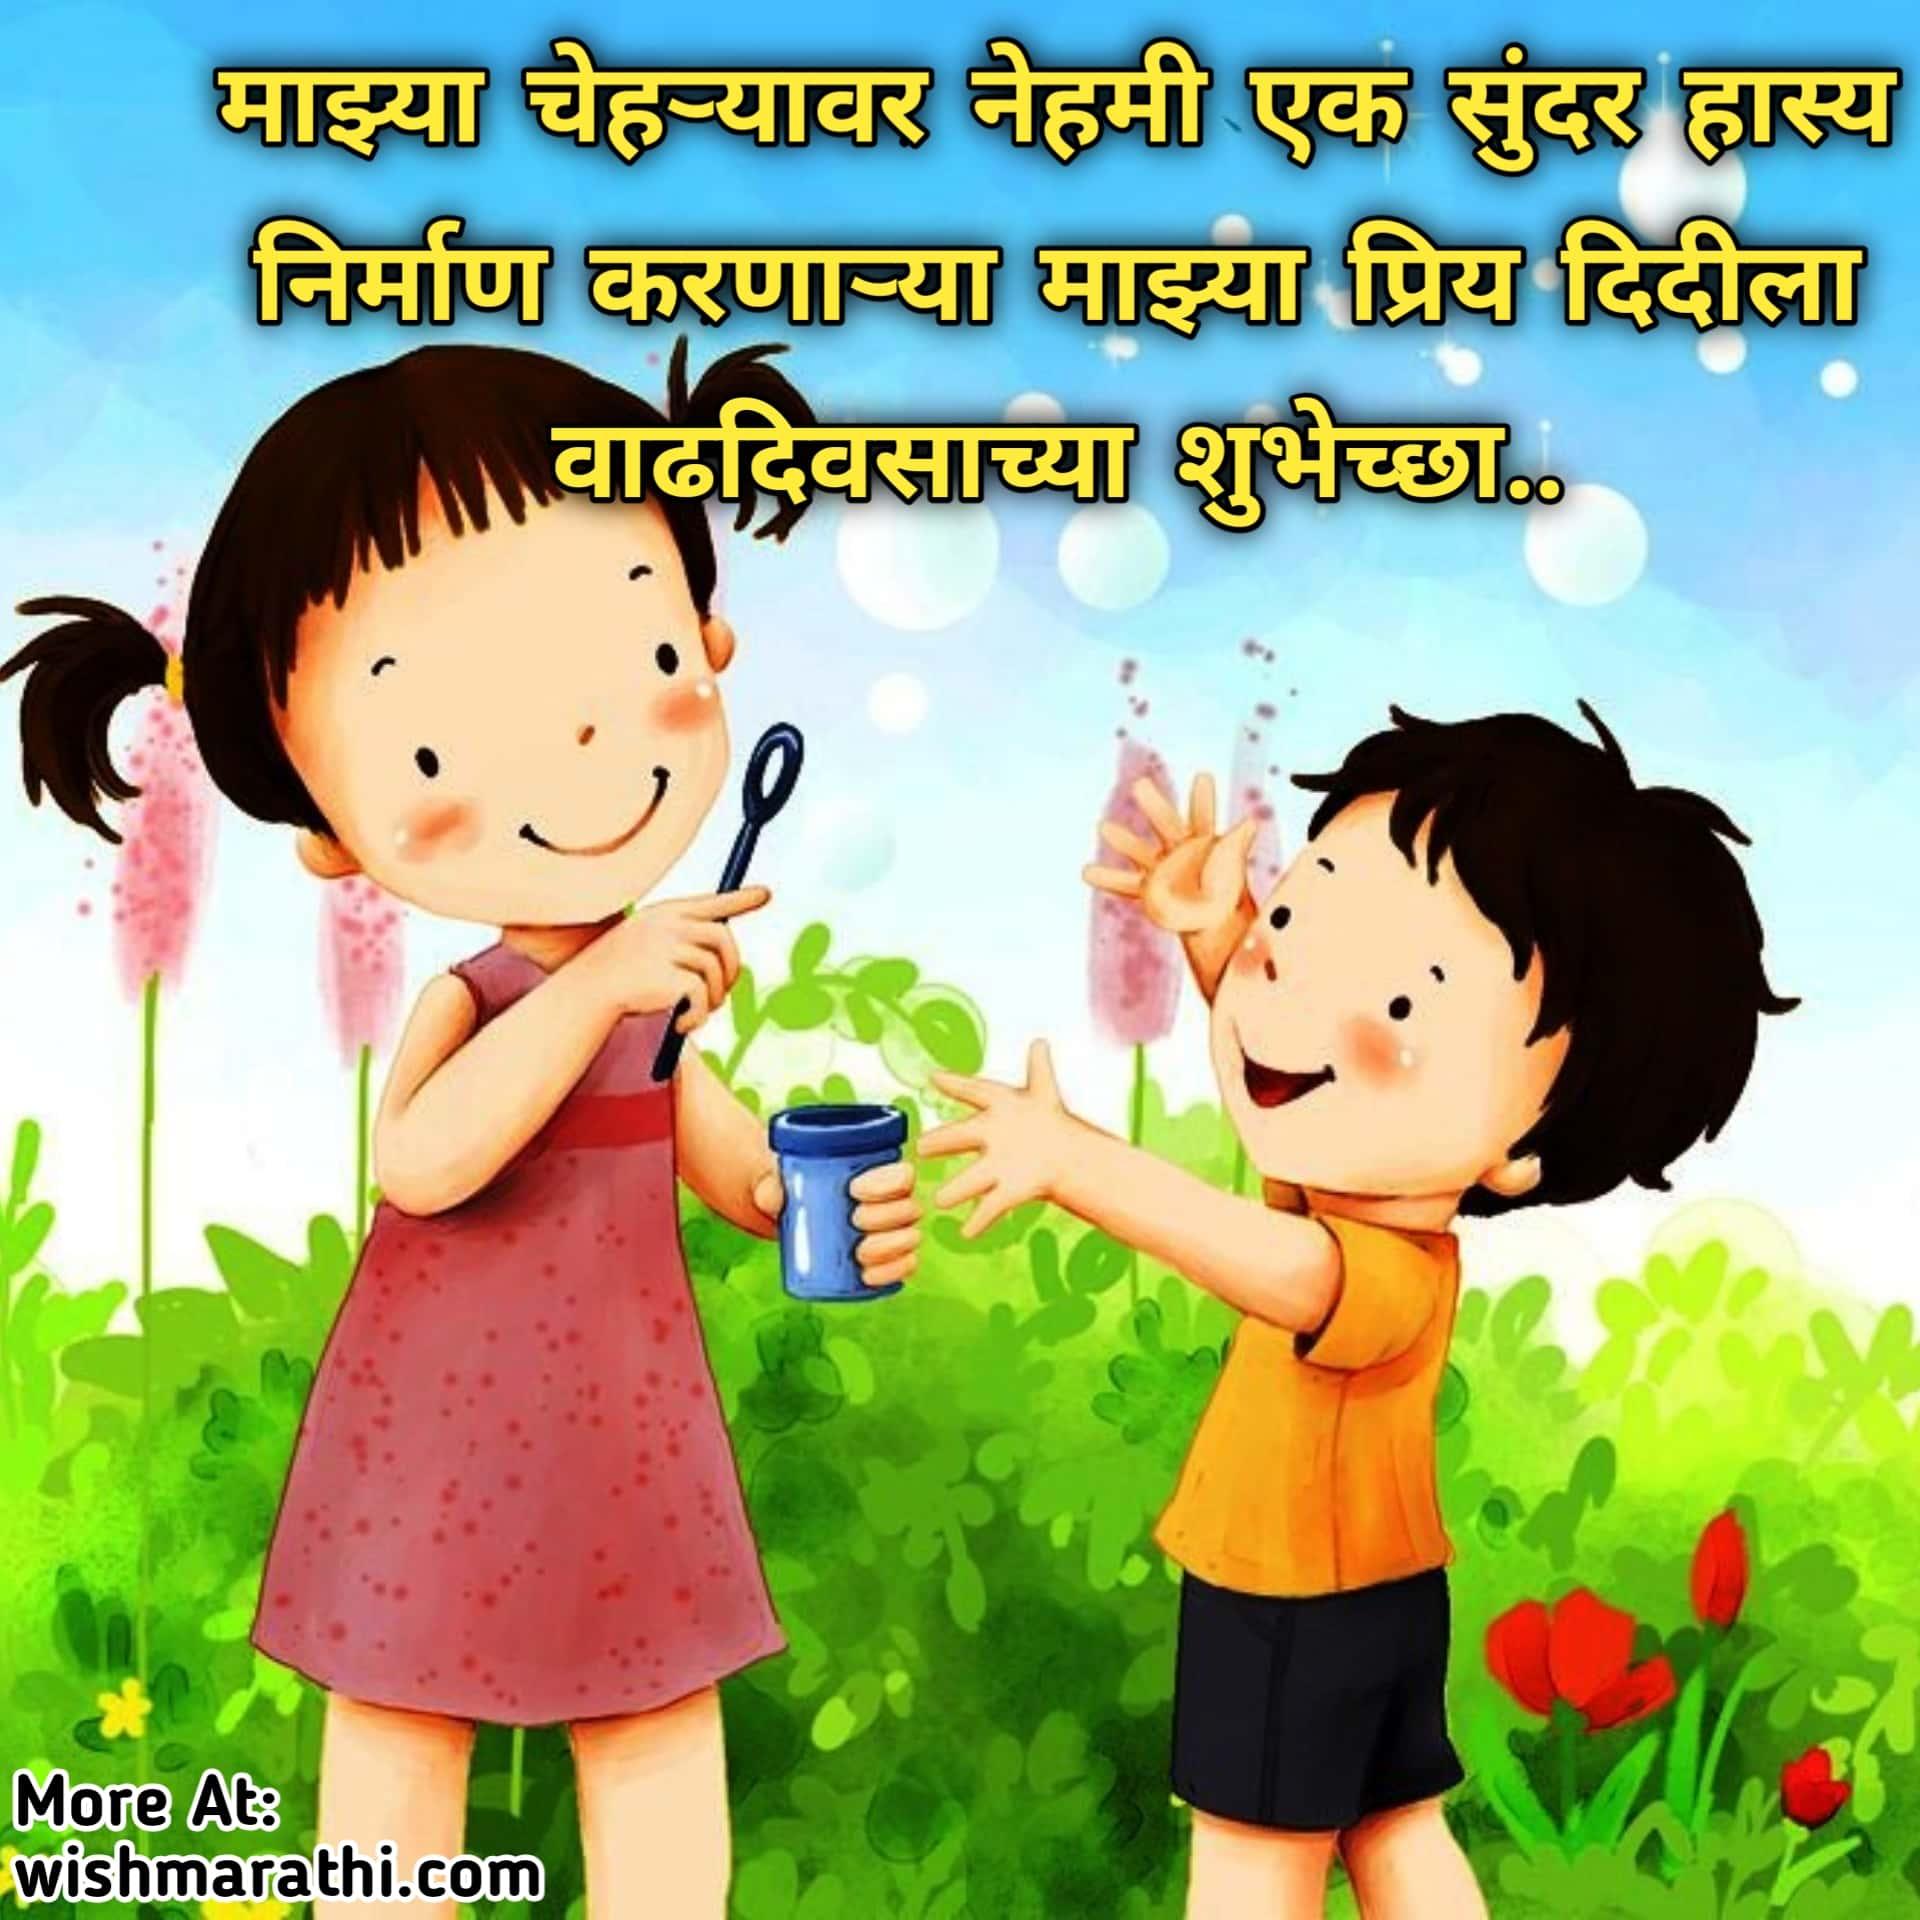 happy birthday sister quotes in marathi